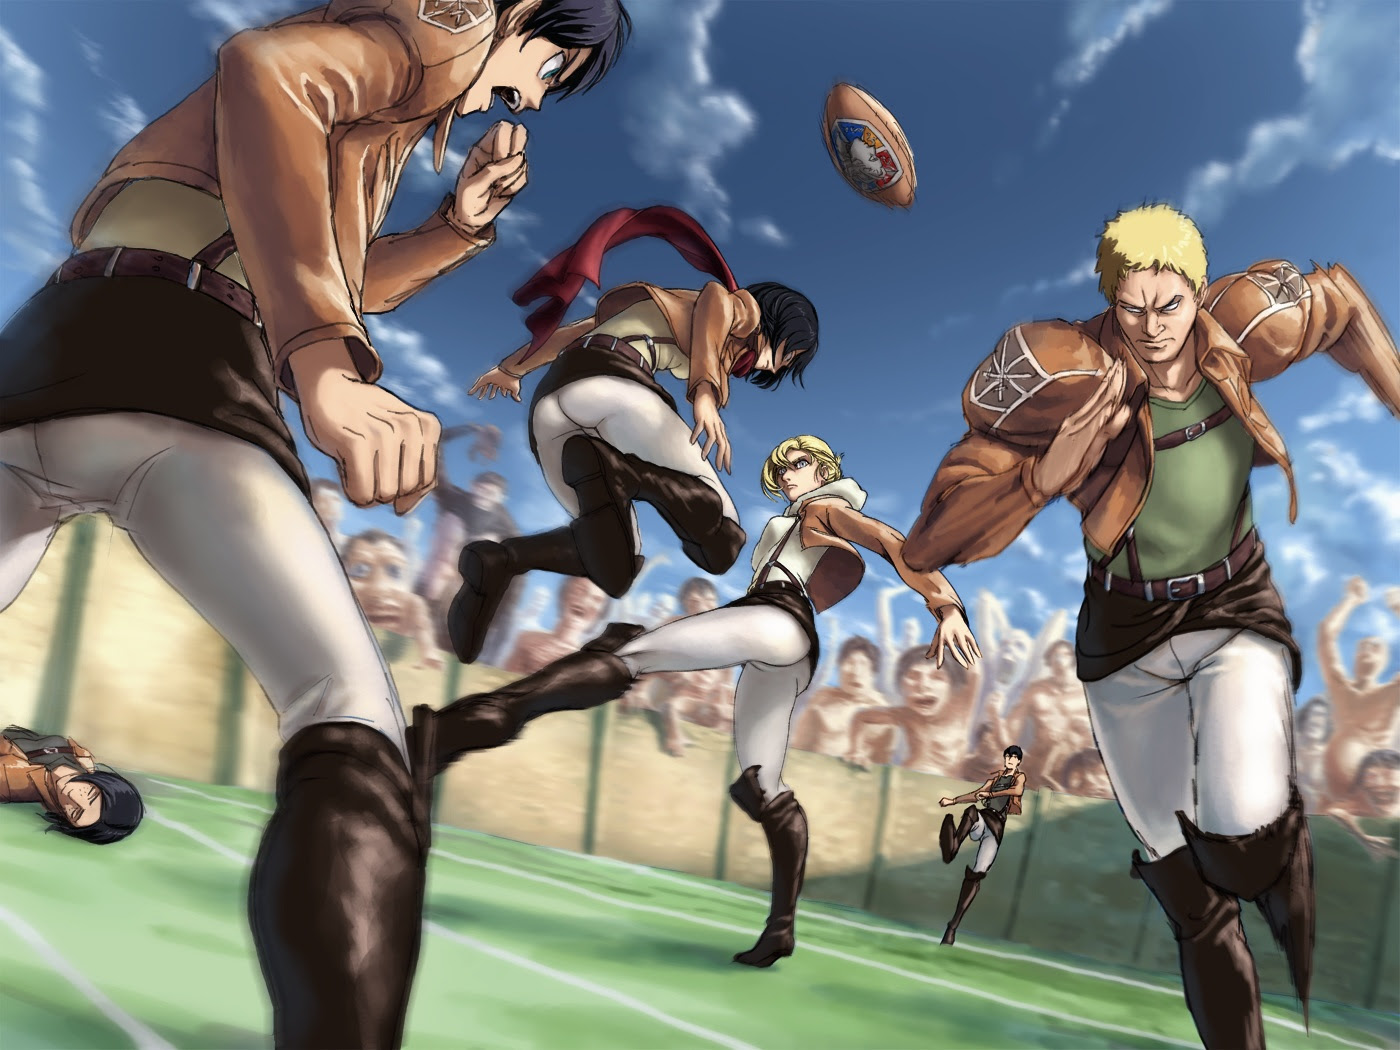 Football Shingeki No Kyojin Attack On Titan Wallpaper 35593428 Fanpop